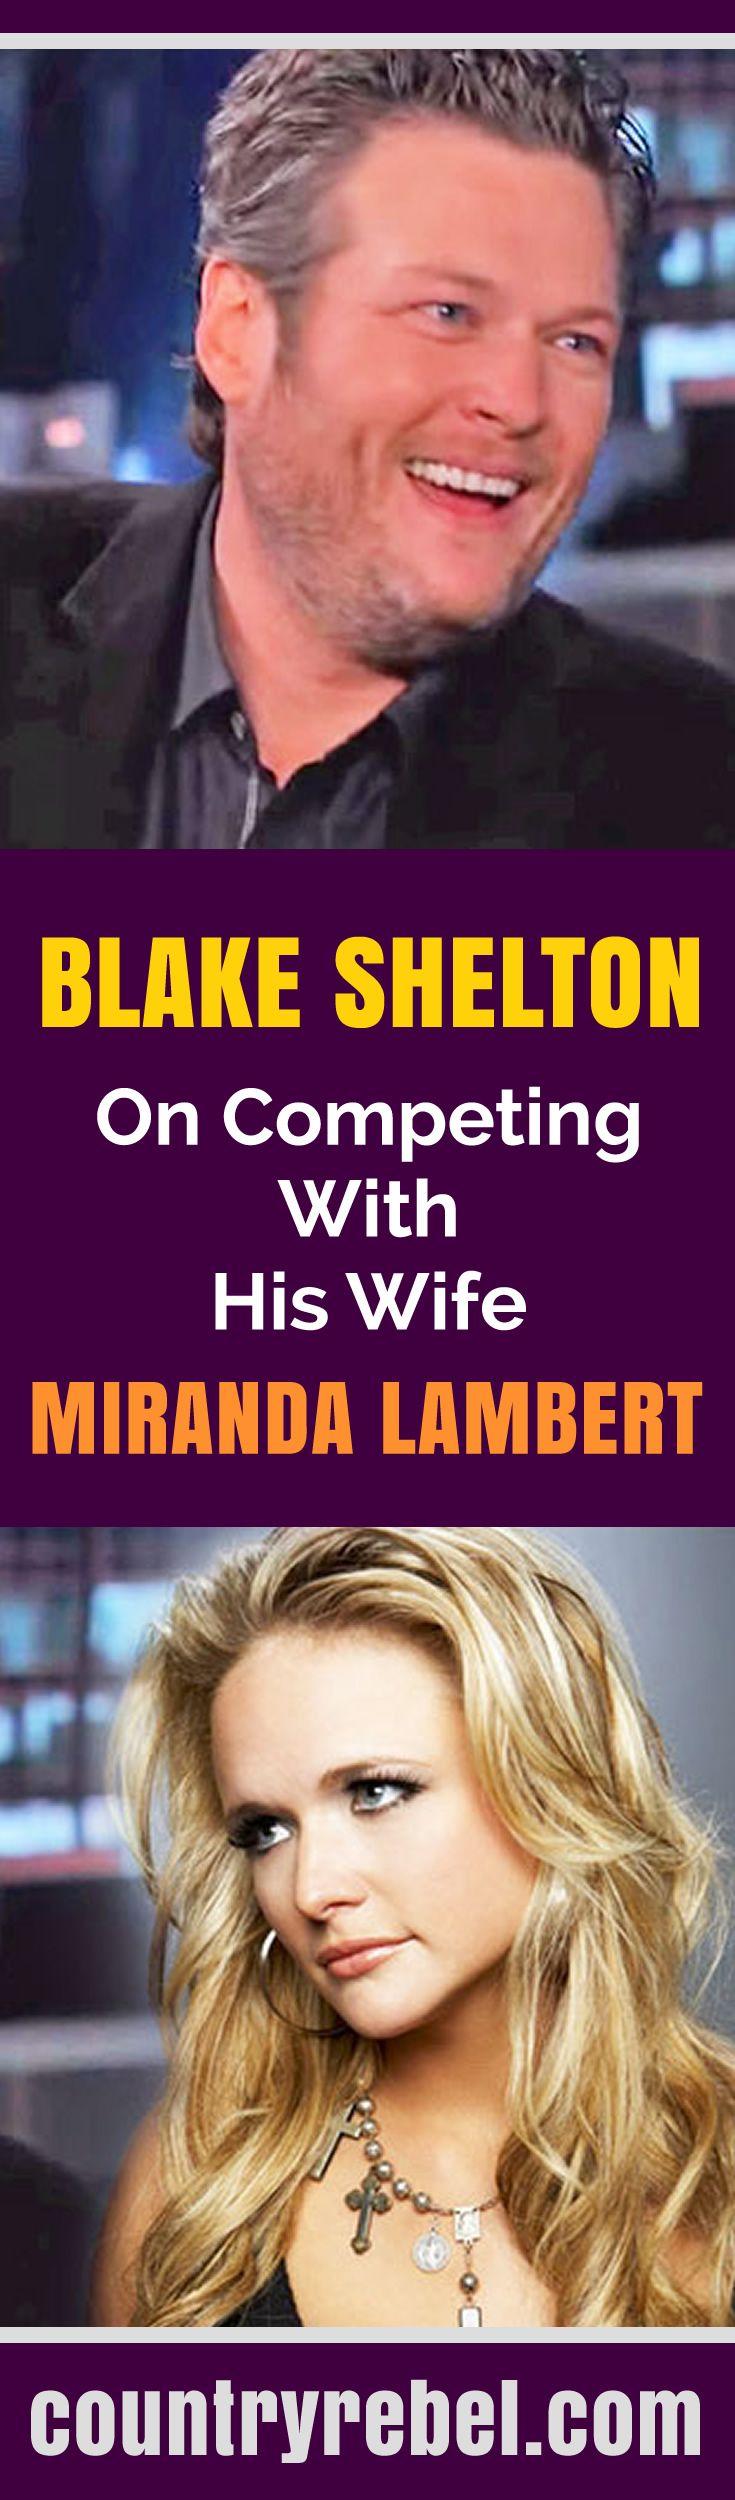 Blake Shelton Talks About Competing With His Wife Miranda Lambert on Jimmy Kimmel Live